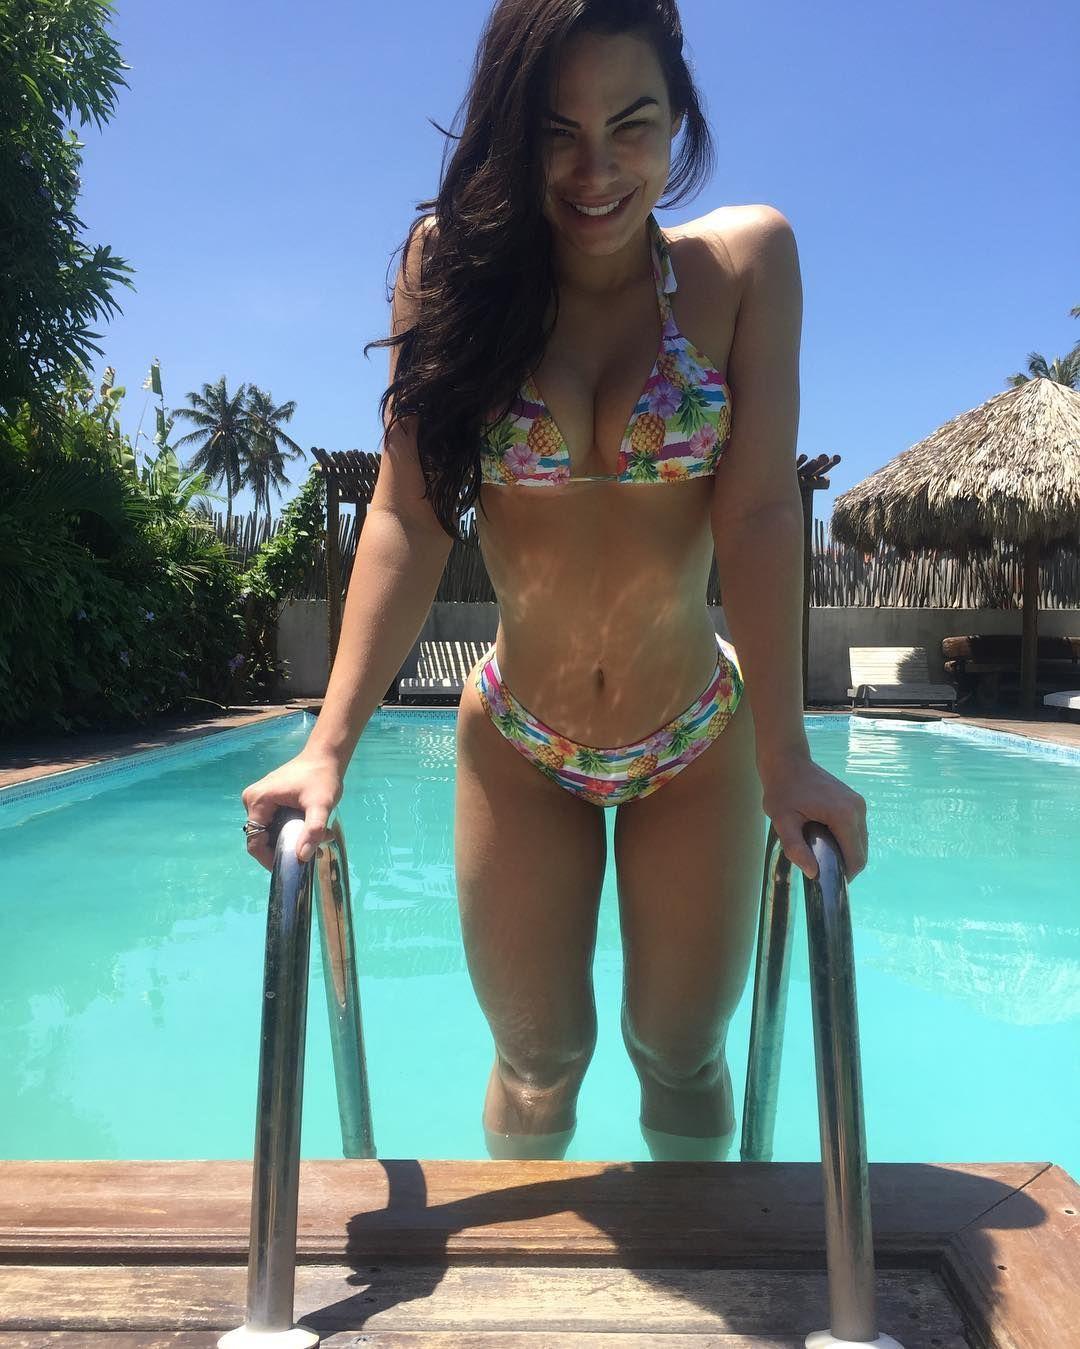 Thong Bikini Butt Vids